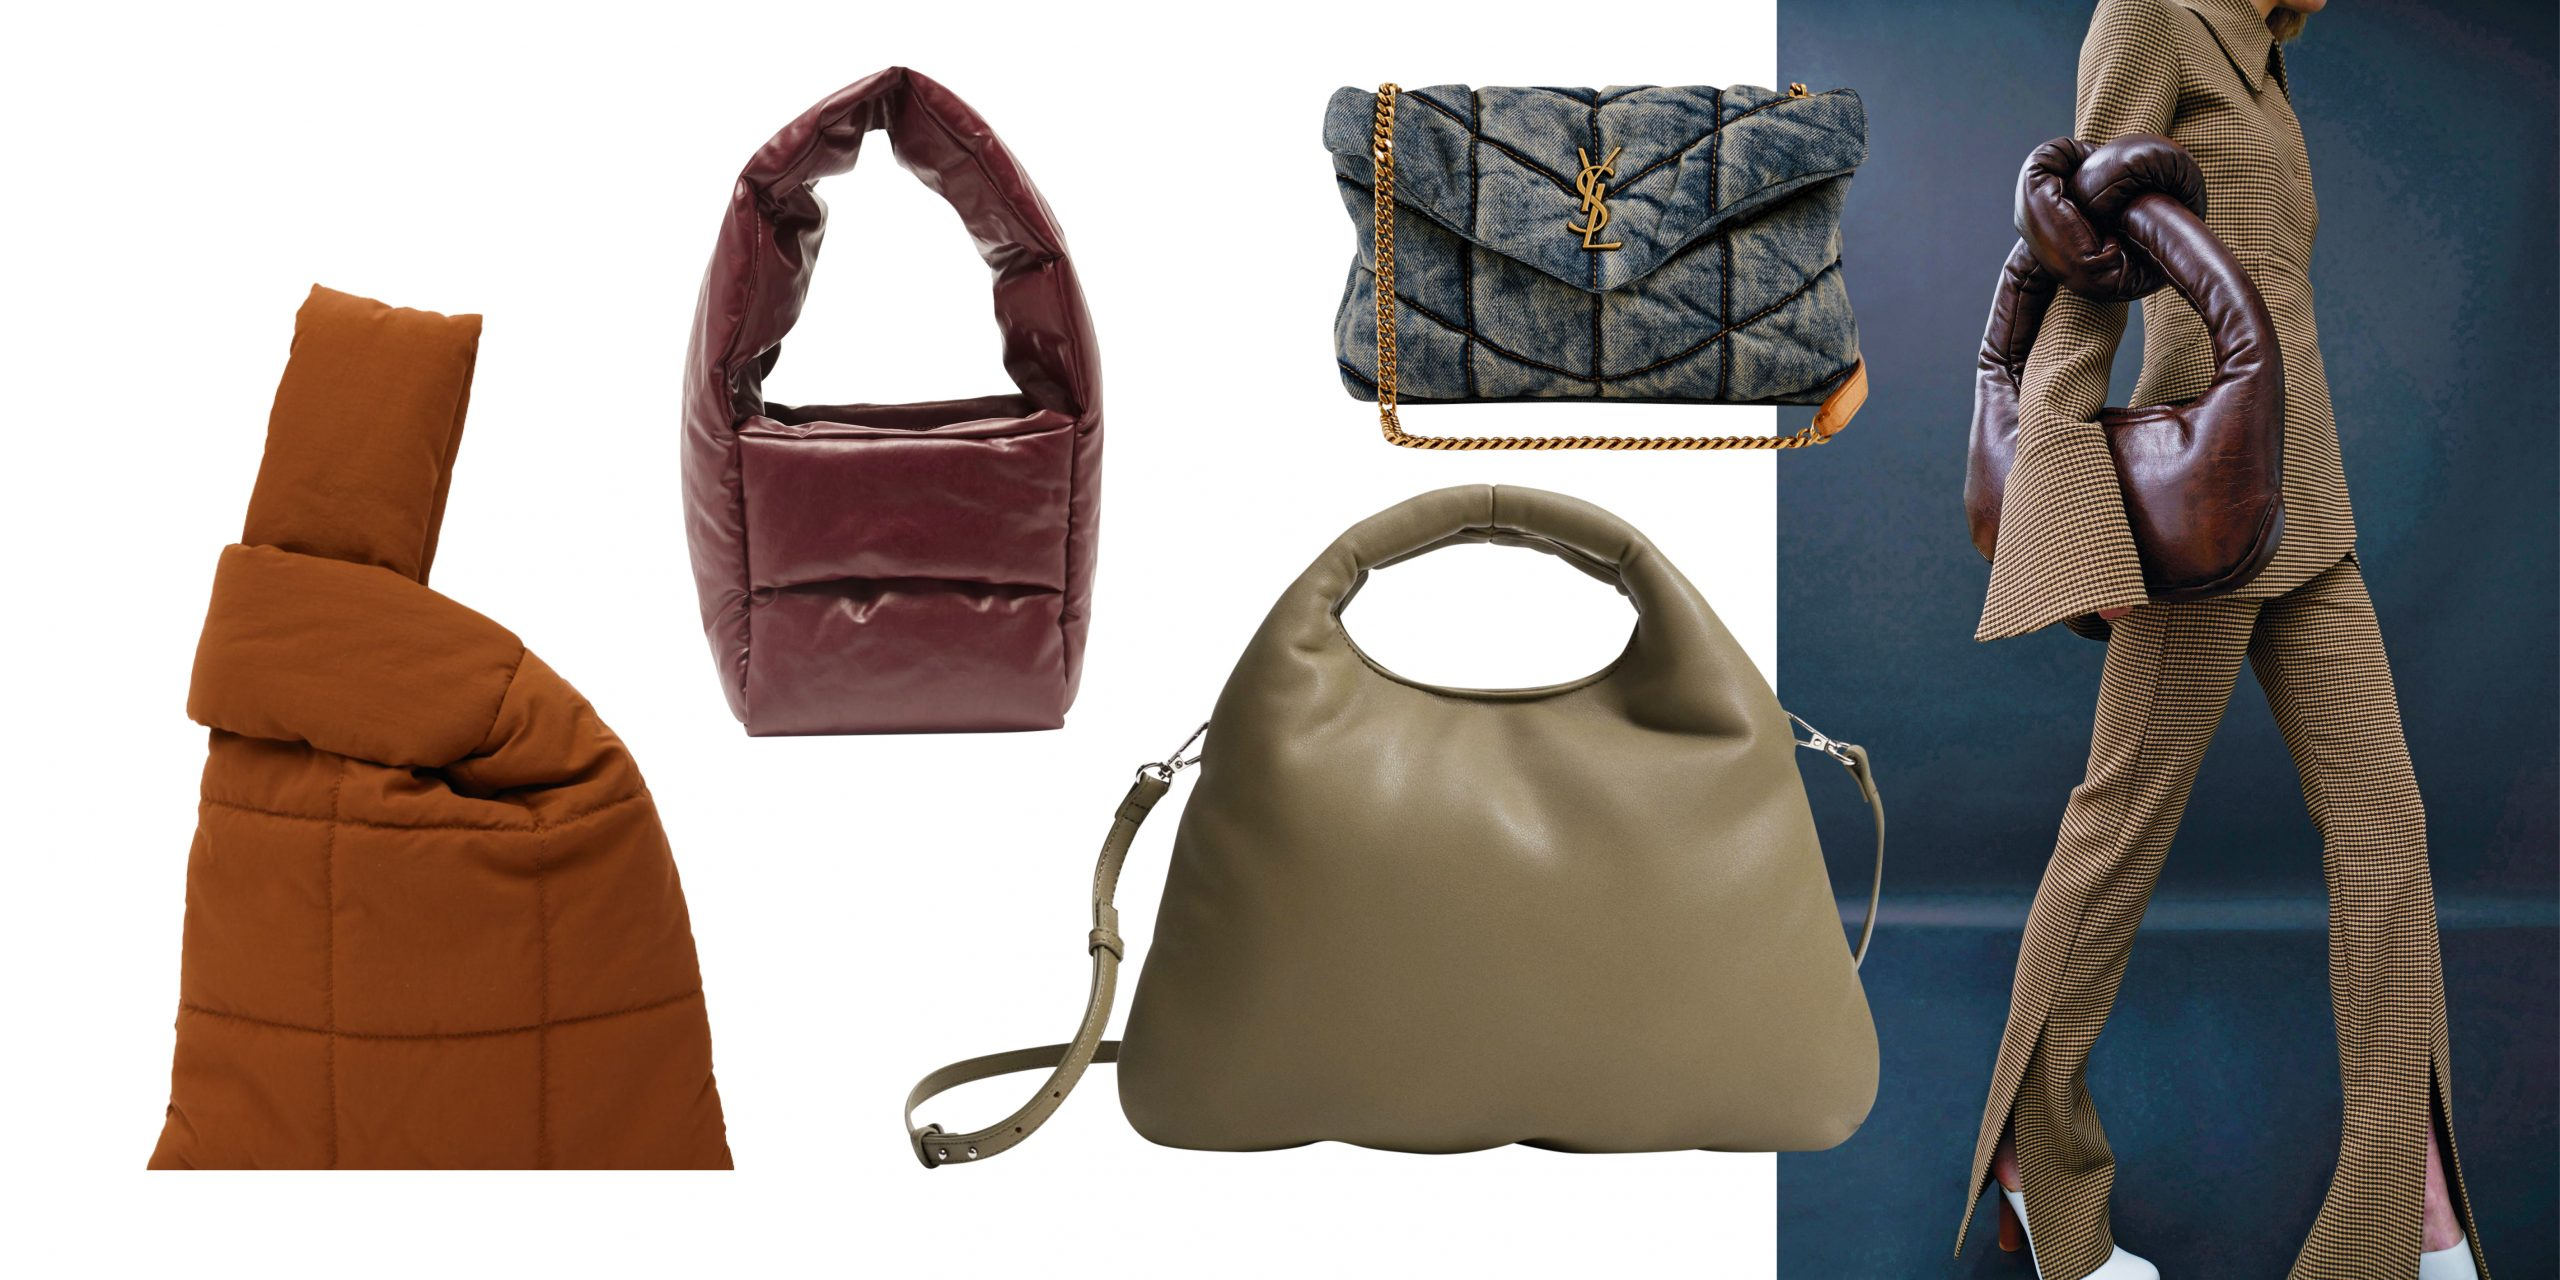 eq377-website_shopping_7_sacs